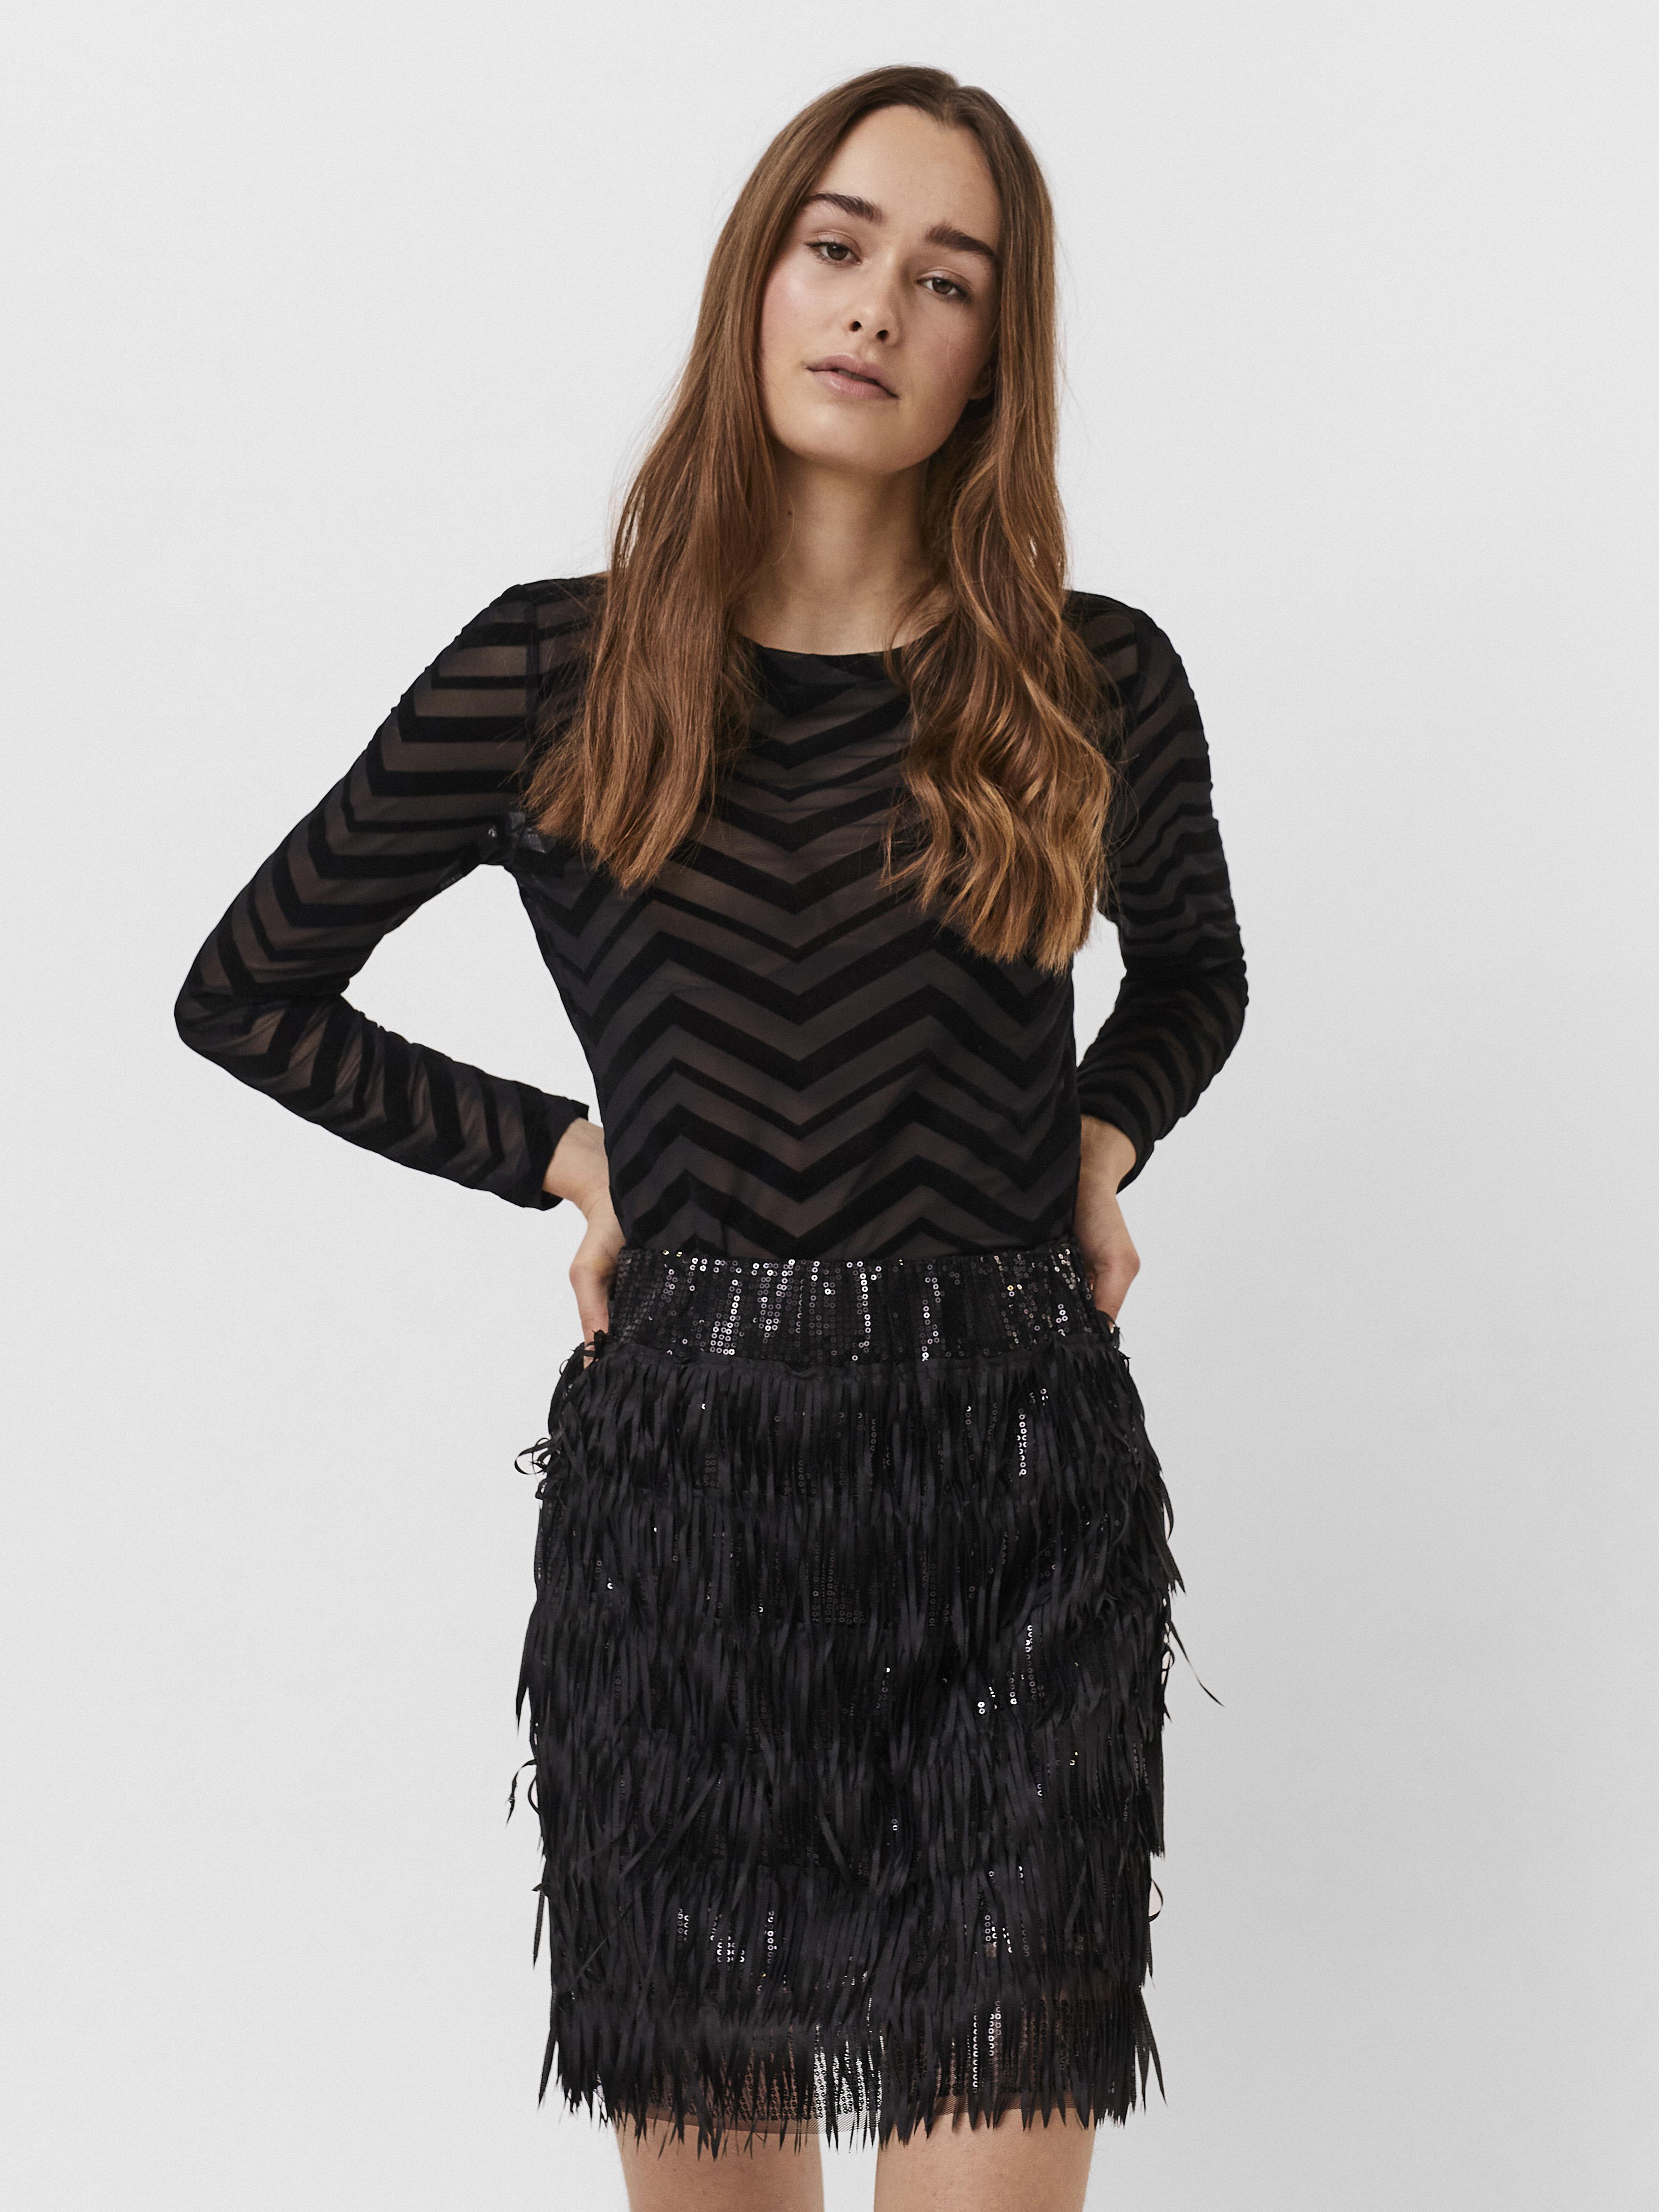 Vero Moda Daya Bluse, Black Zig Zag, S